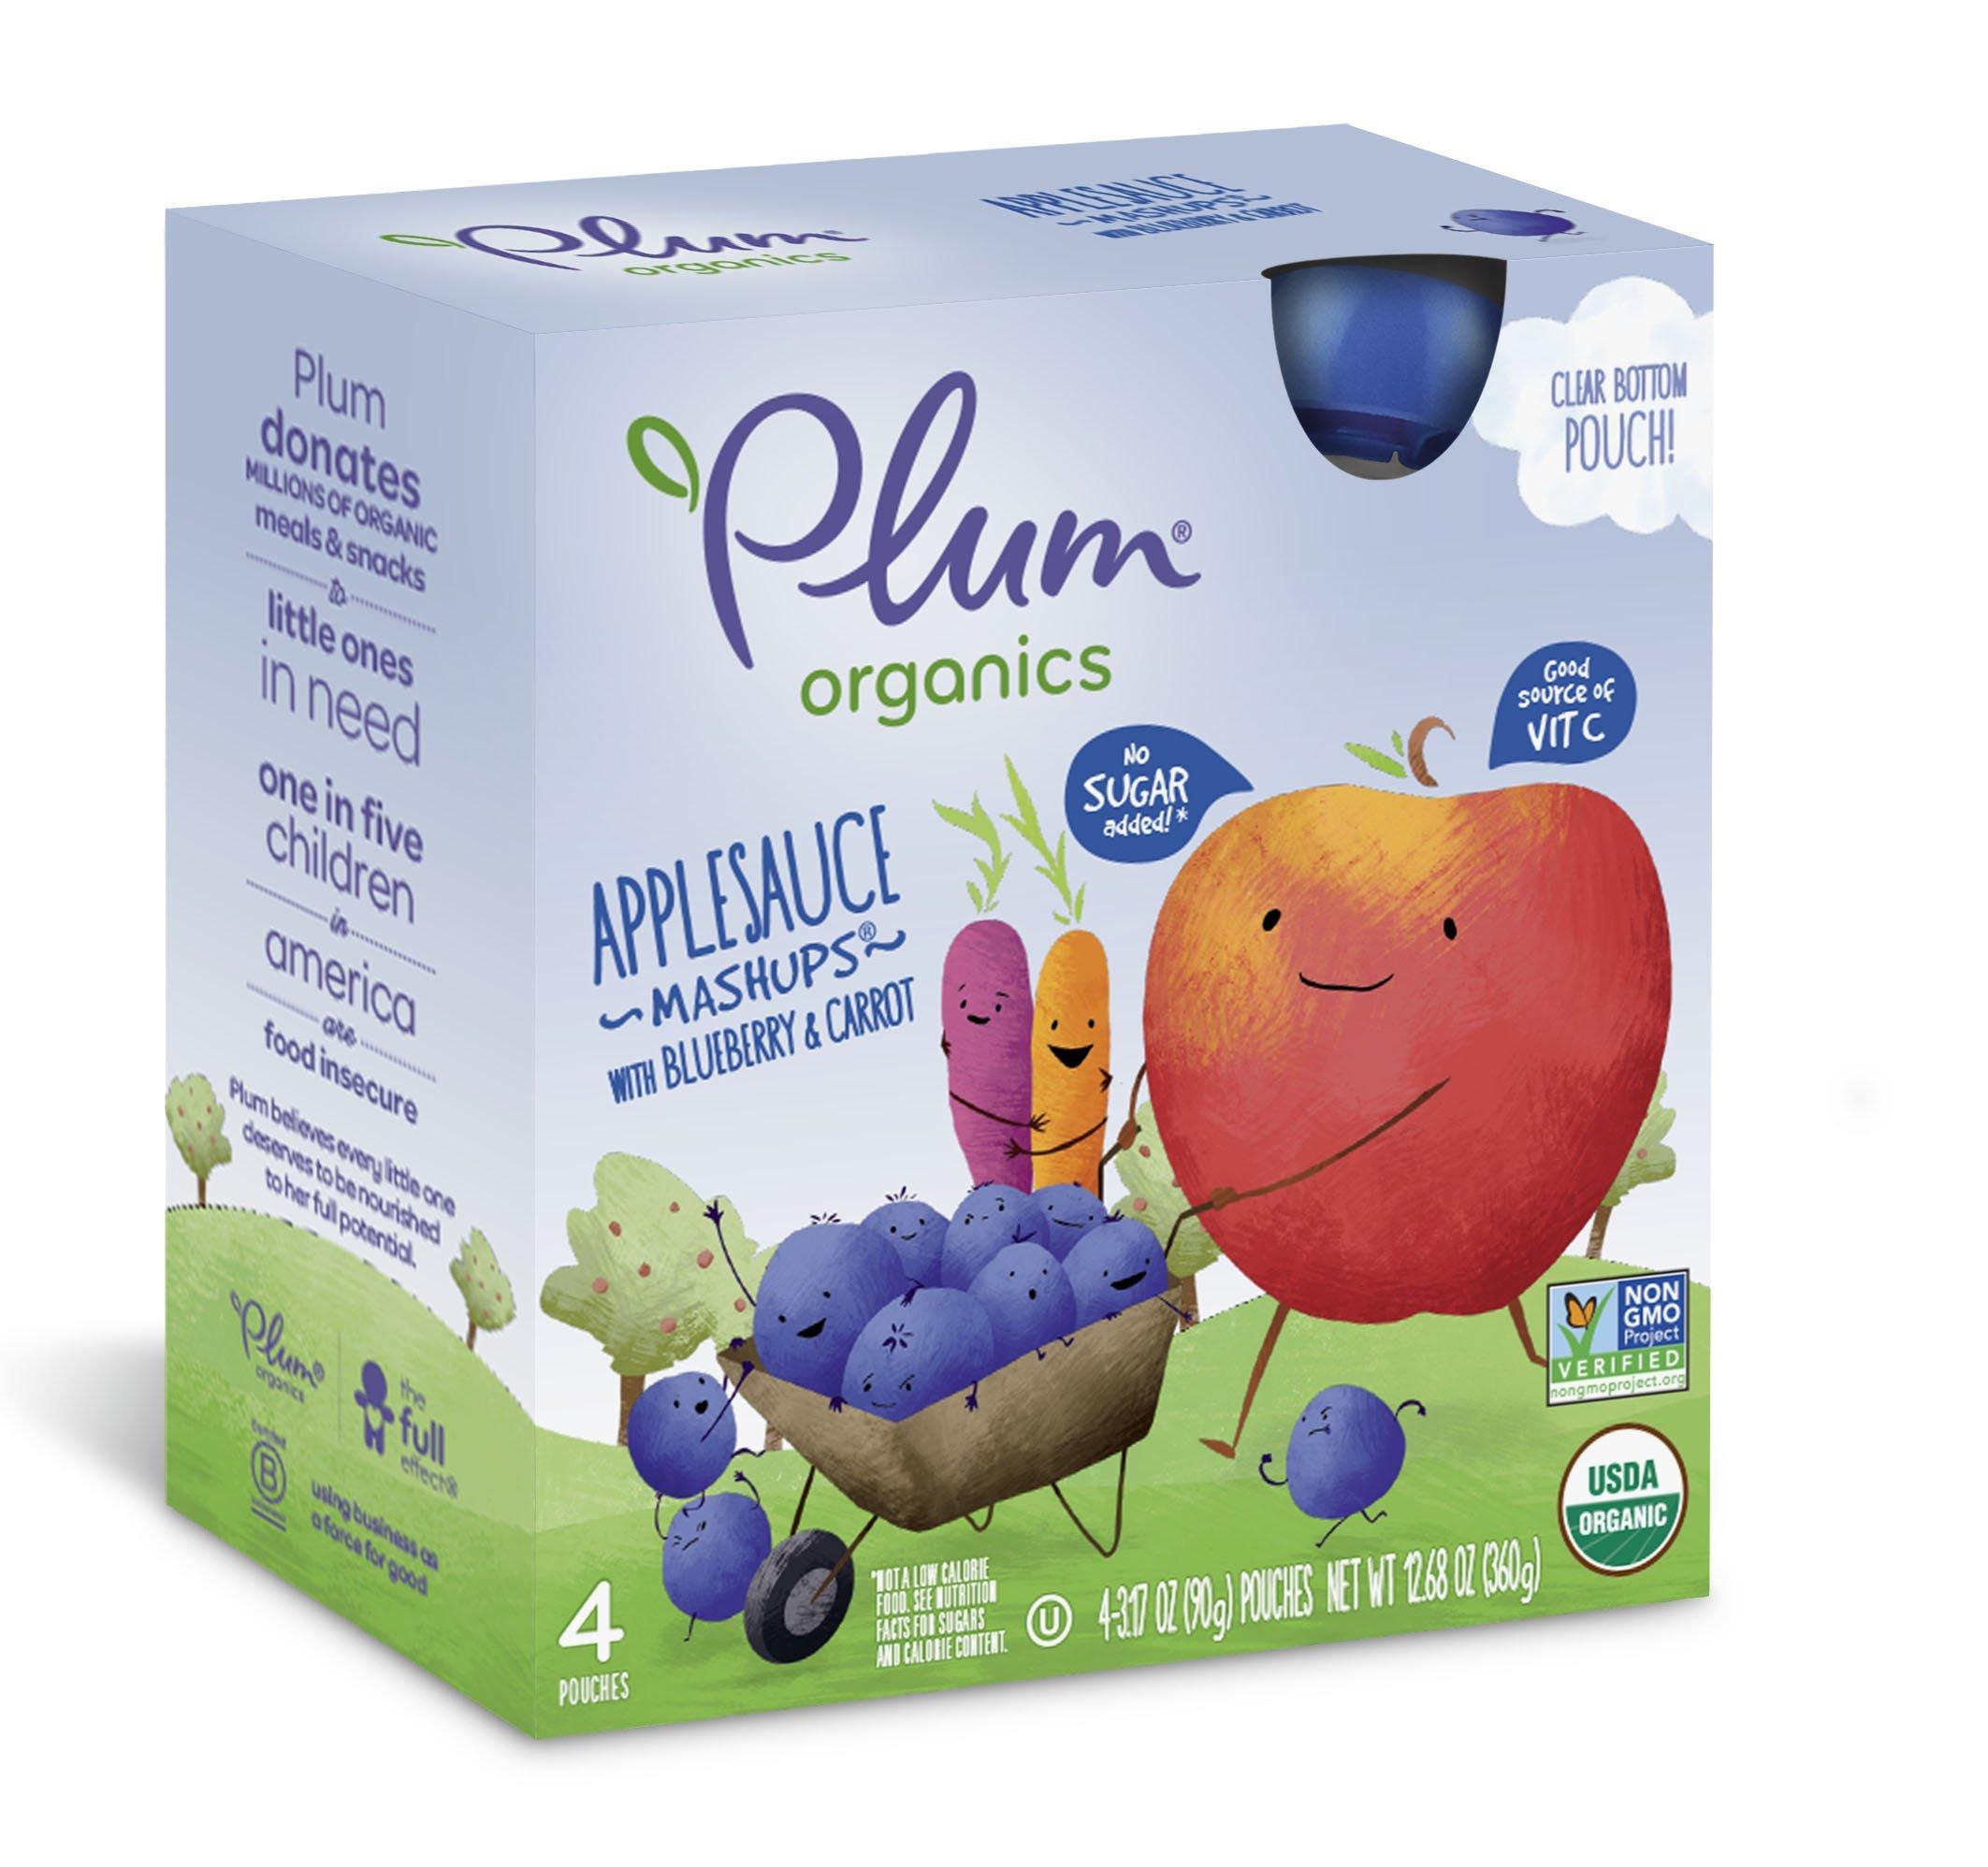 Plum Organics Mashups, Organic Kids Applesauce, Blueberry & Carrot, 3.17 ounce pouch, 4 count (Pack of 6) by Plum Organics